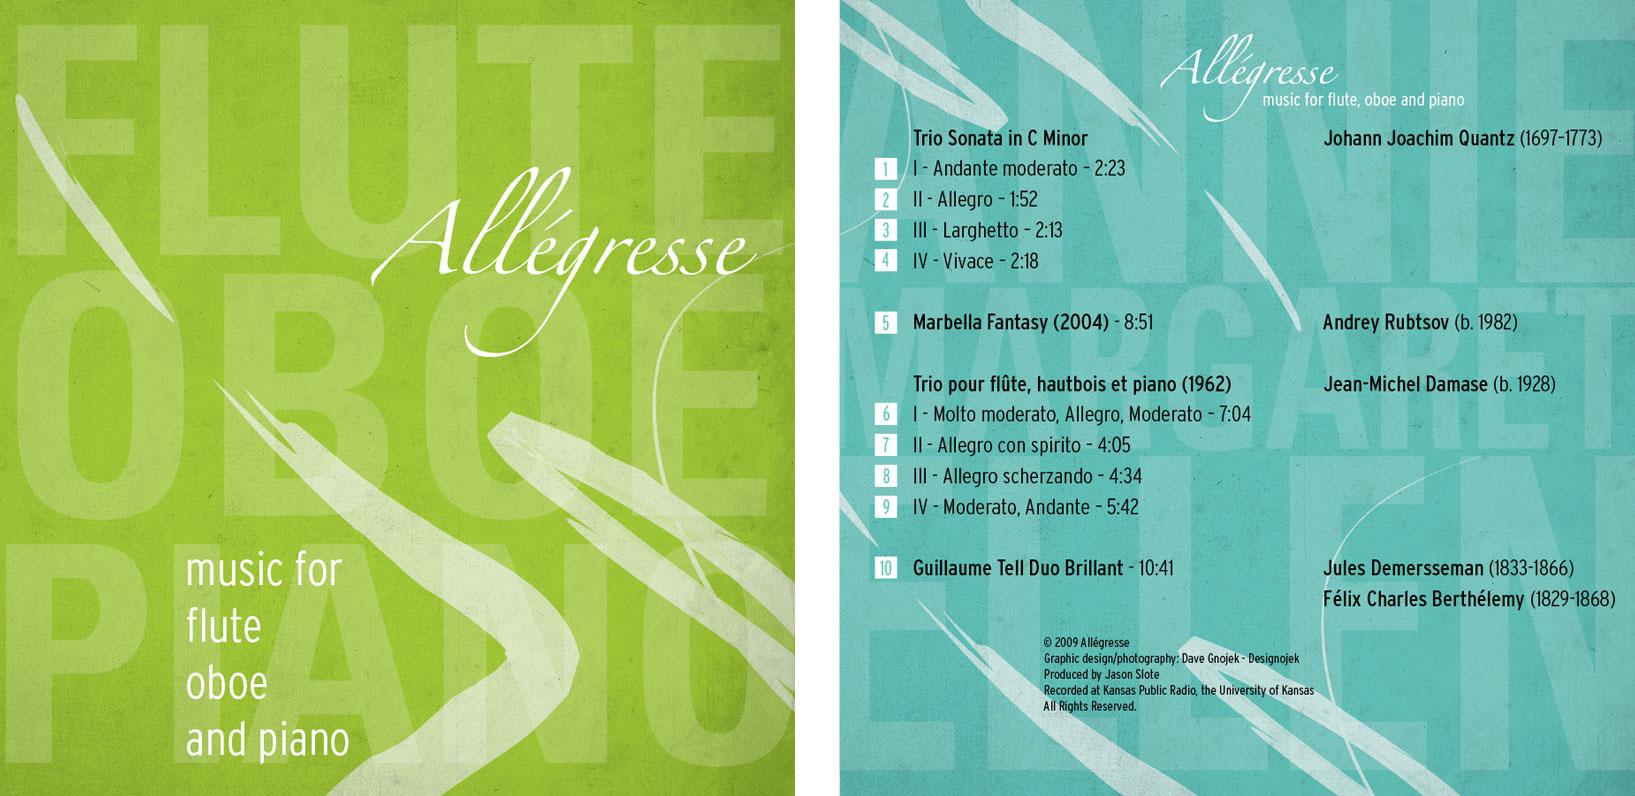 Allegresse - Music for Flute, Oboe, and Piano cover